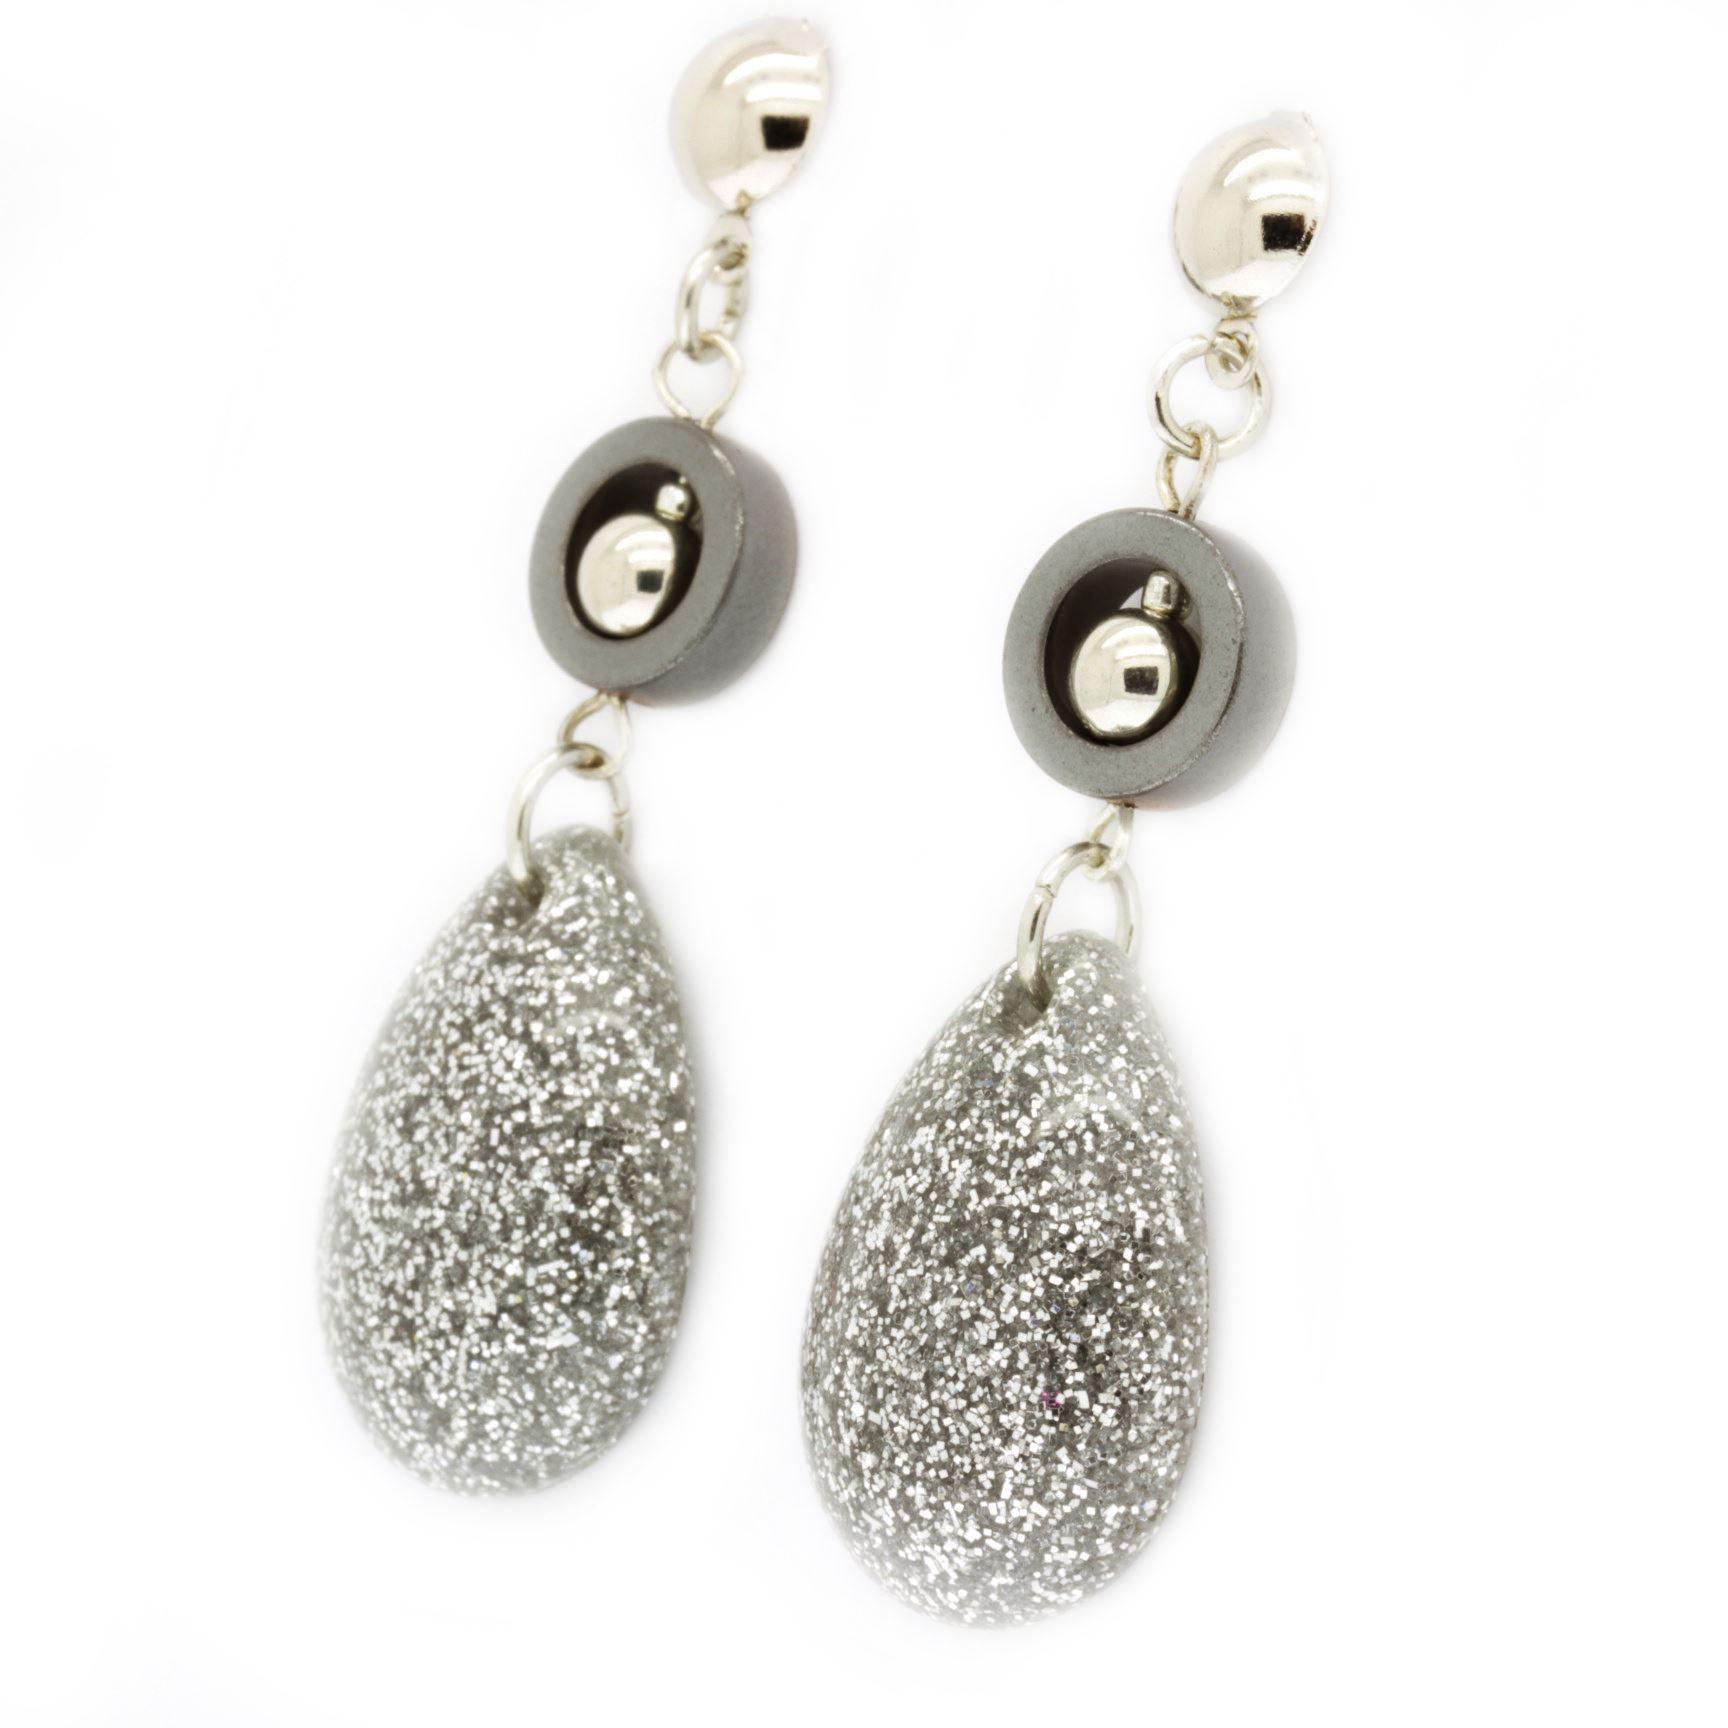 Drop earrings in resin